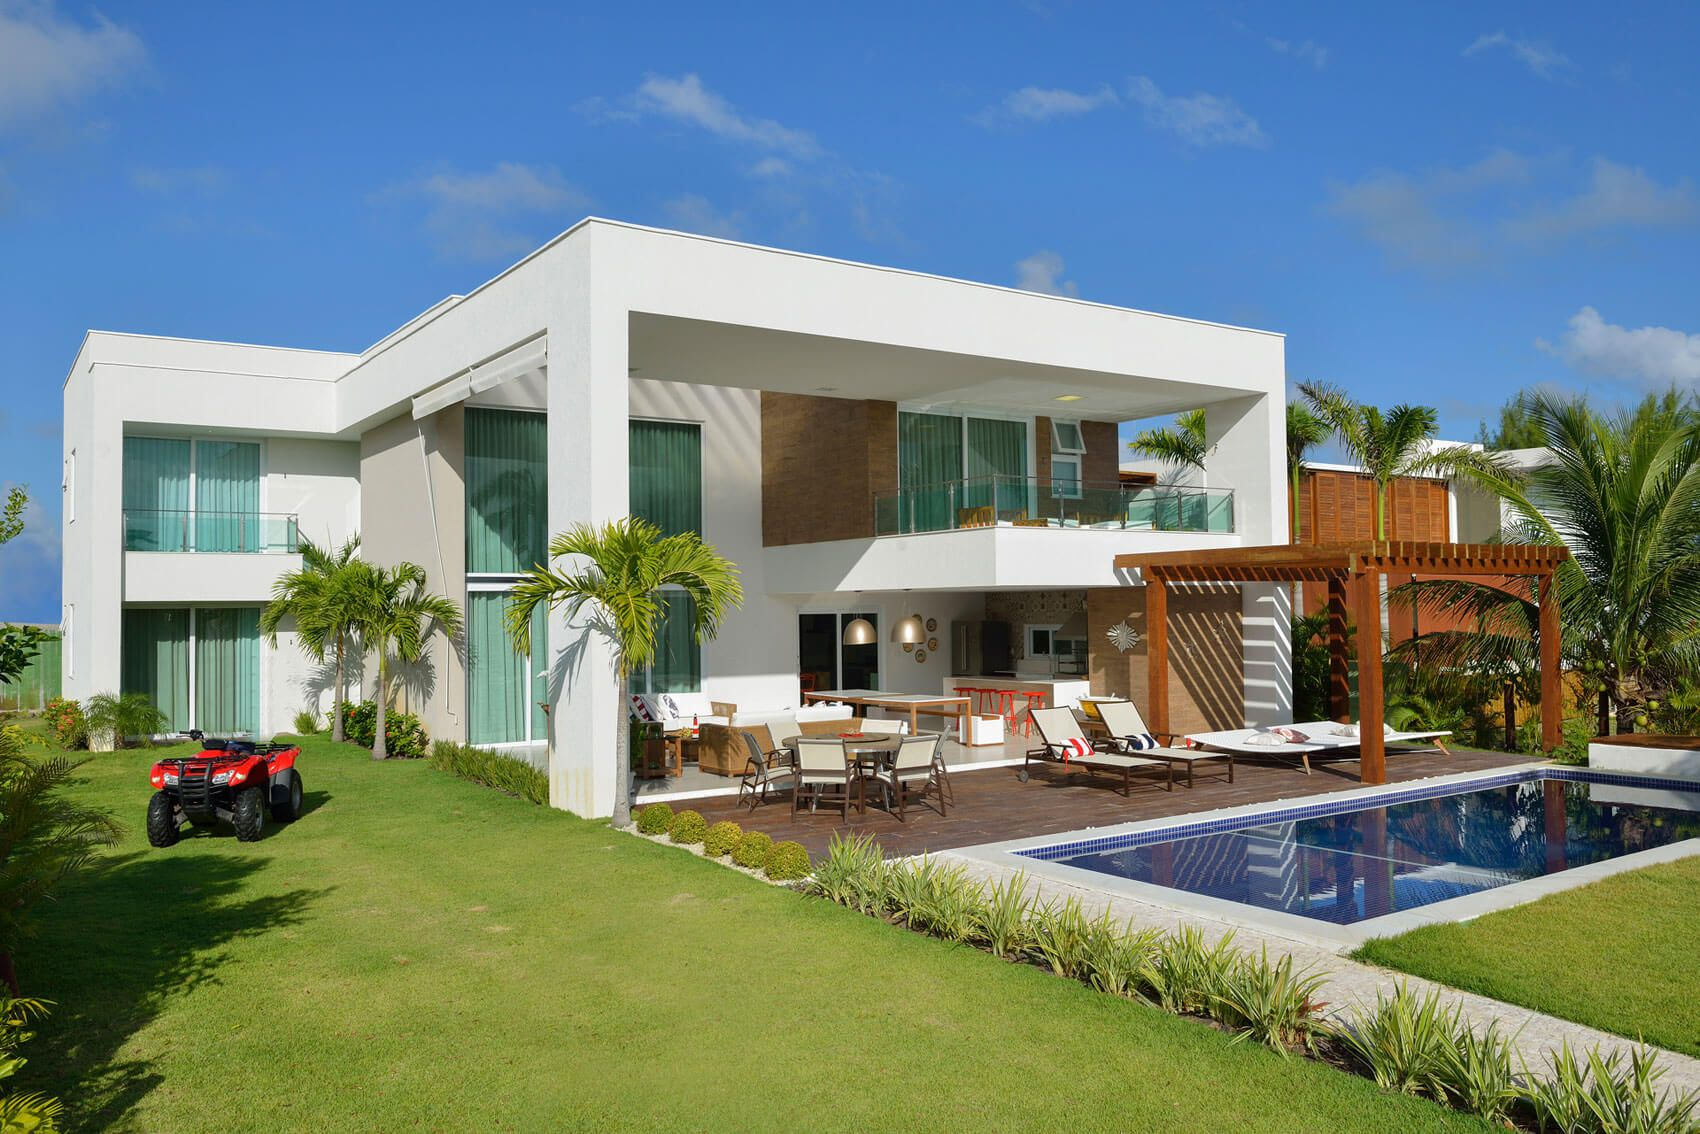 House in Bahia by Pinheiro Martinez Arquitetura | Fachadas ...